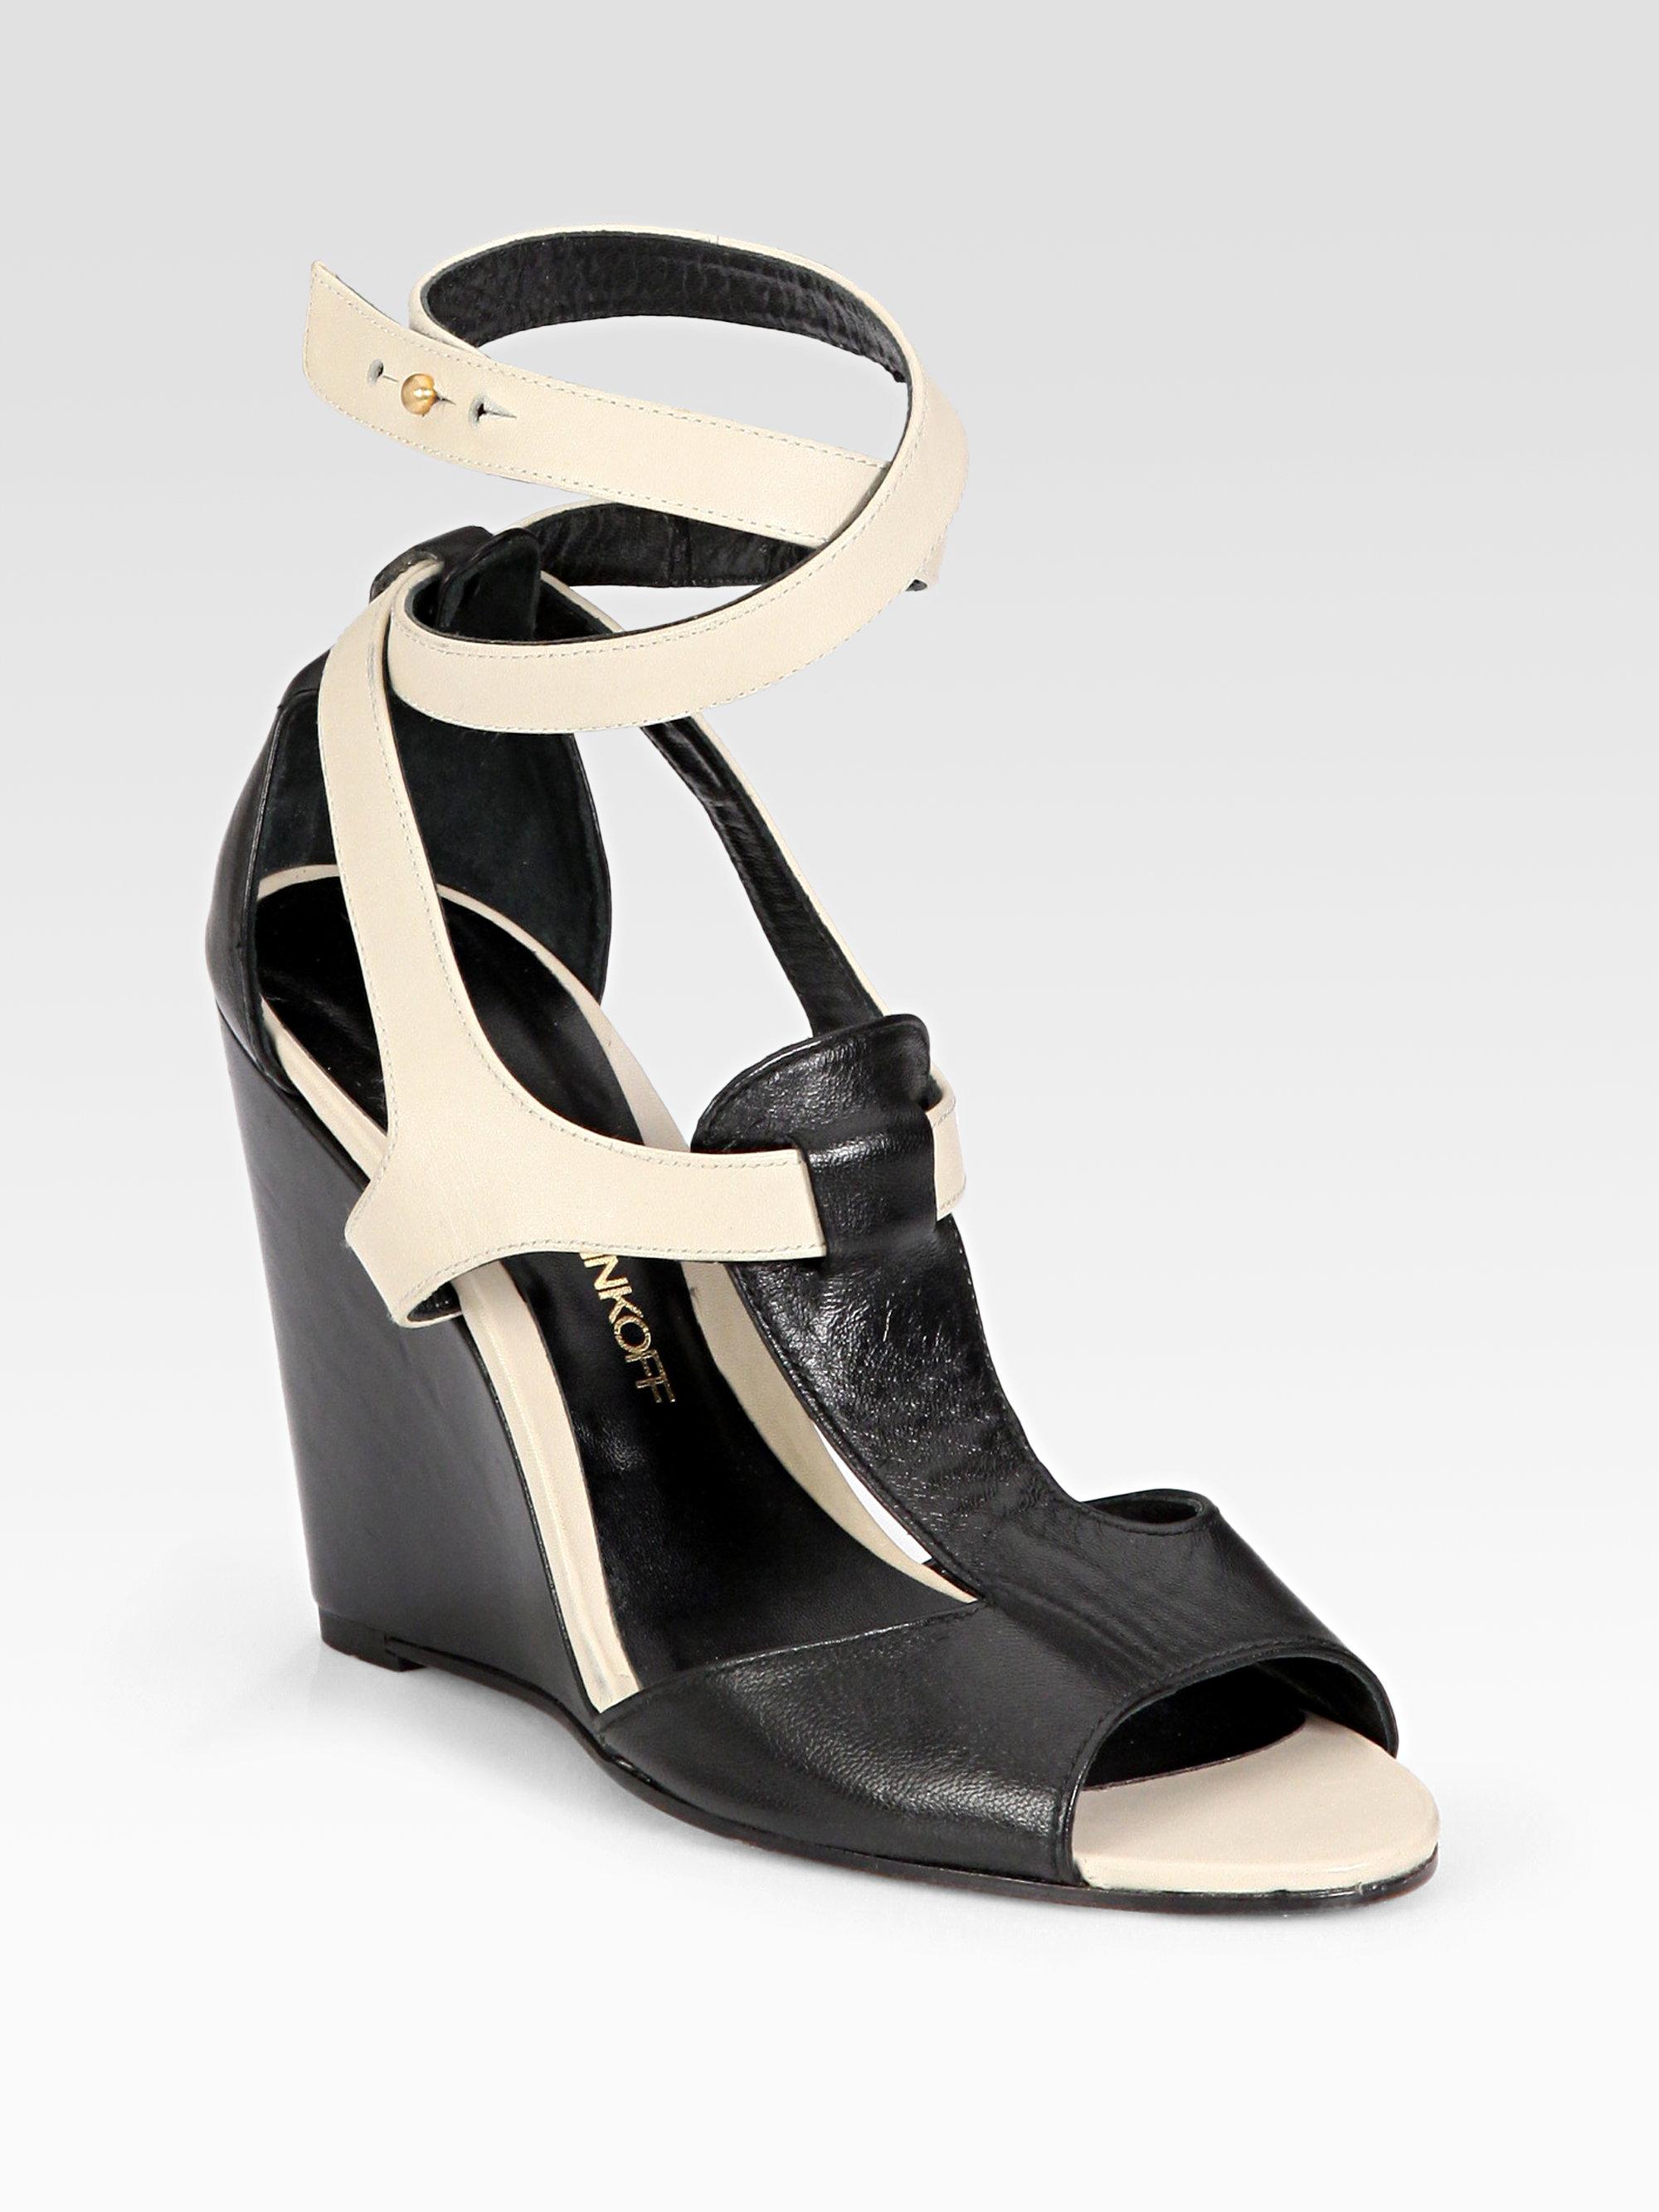 Rebecca Minkoff Dupio Bicolor Leather Wedge Sandals In